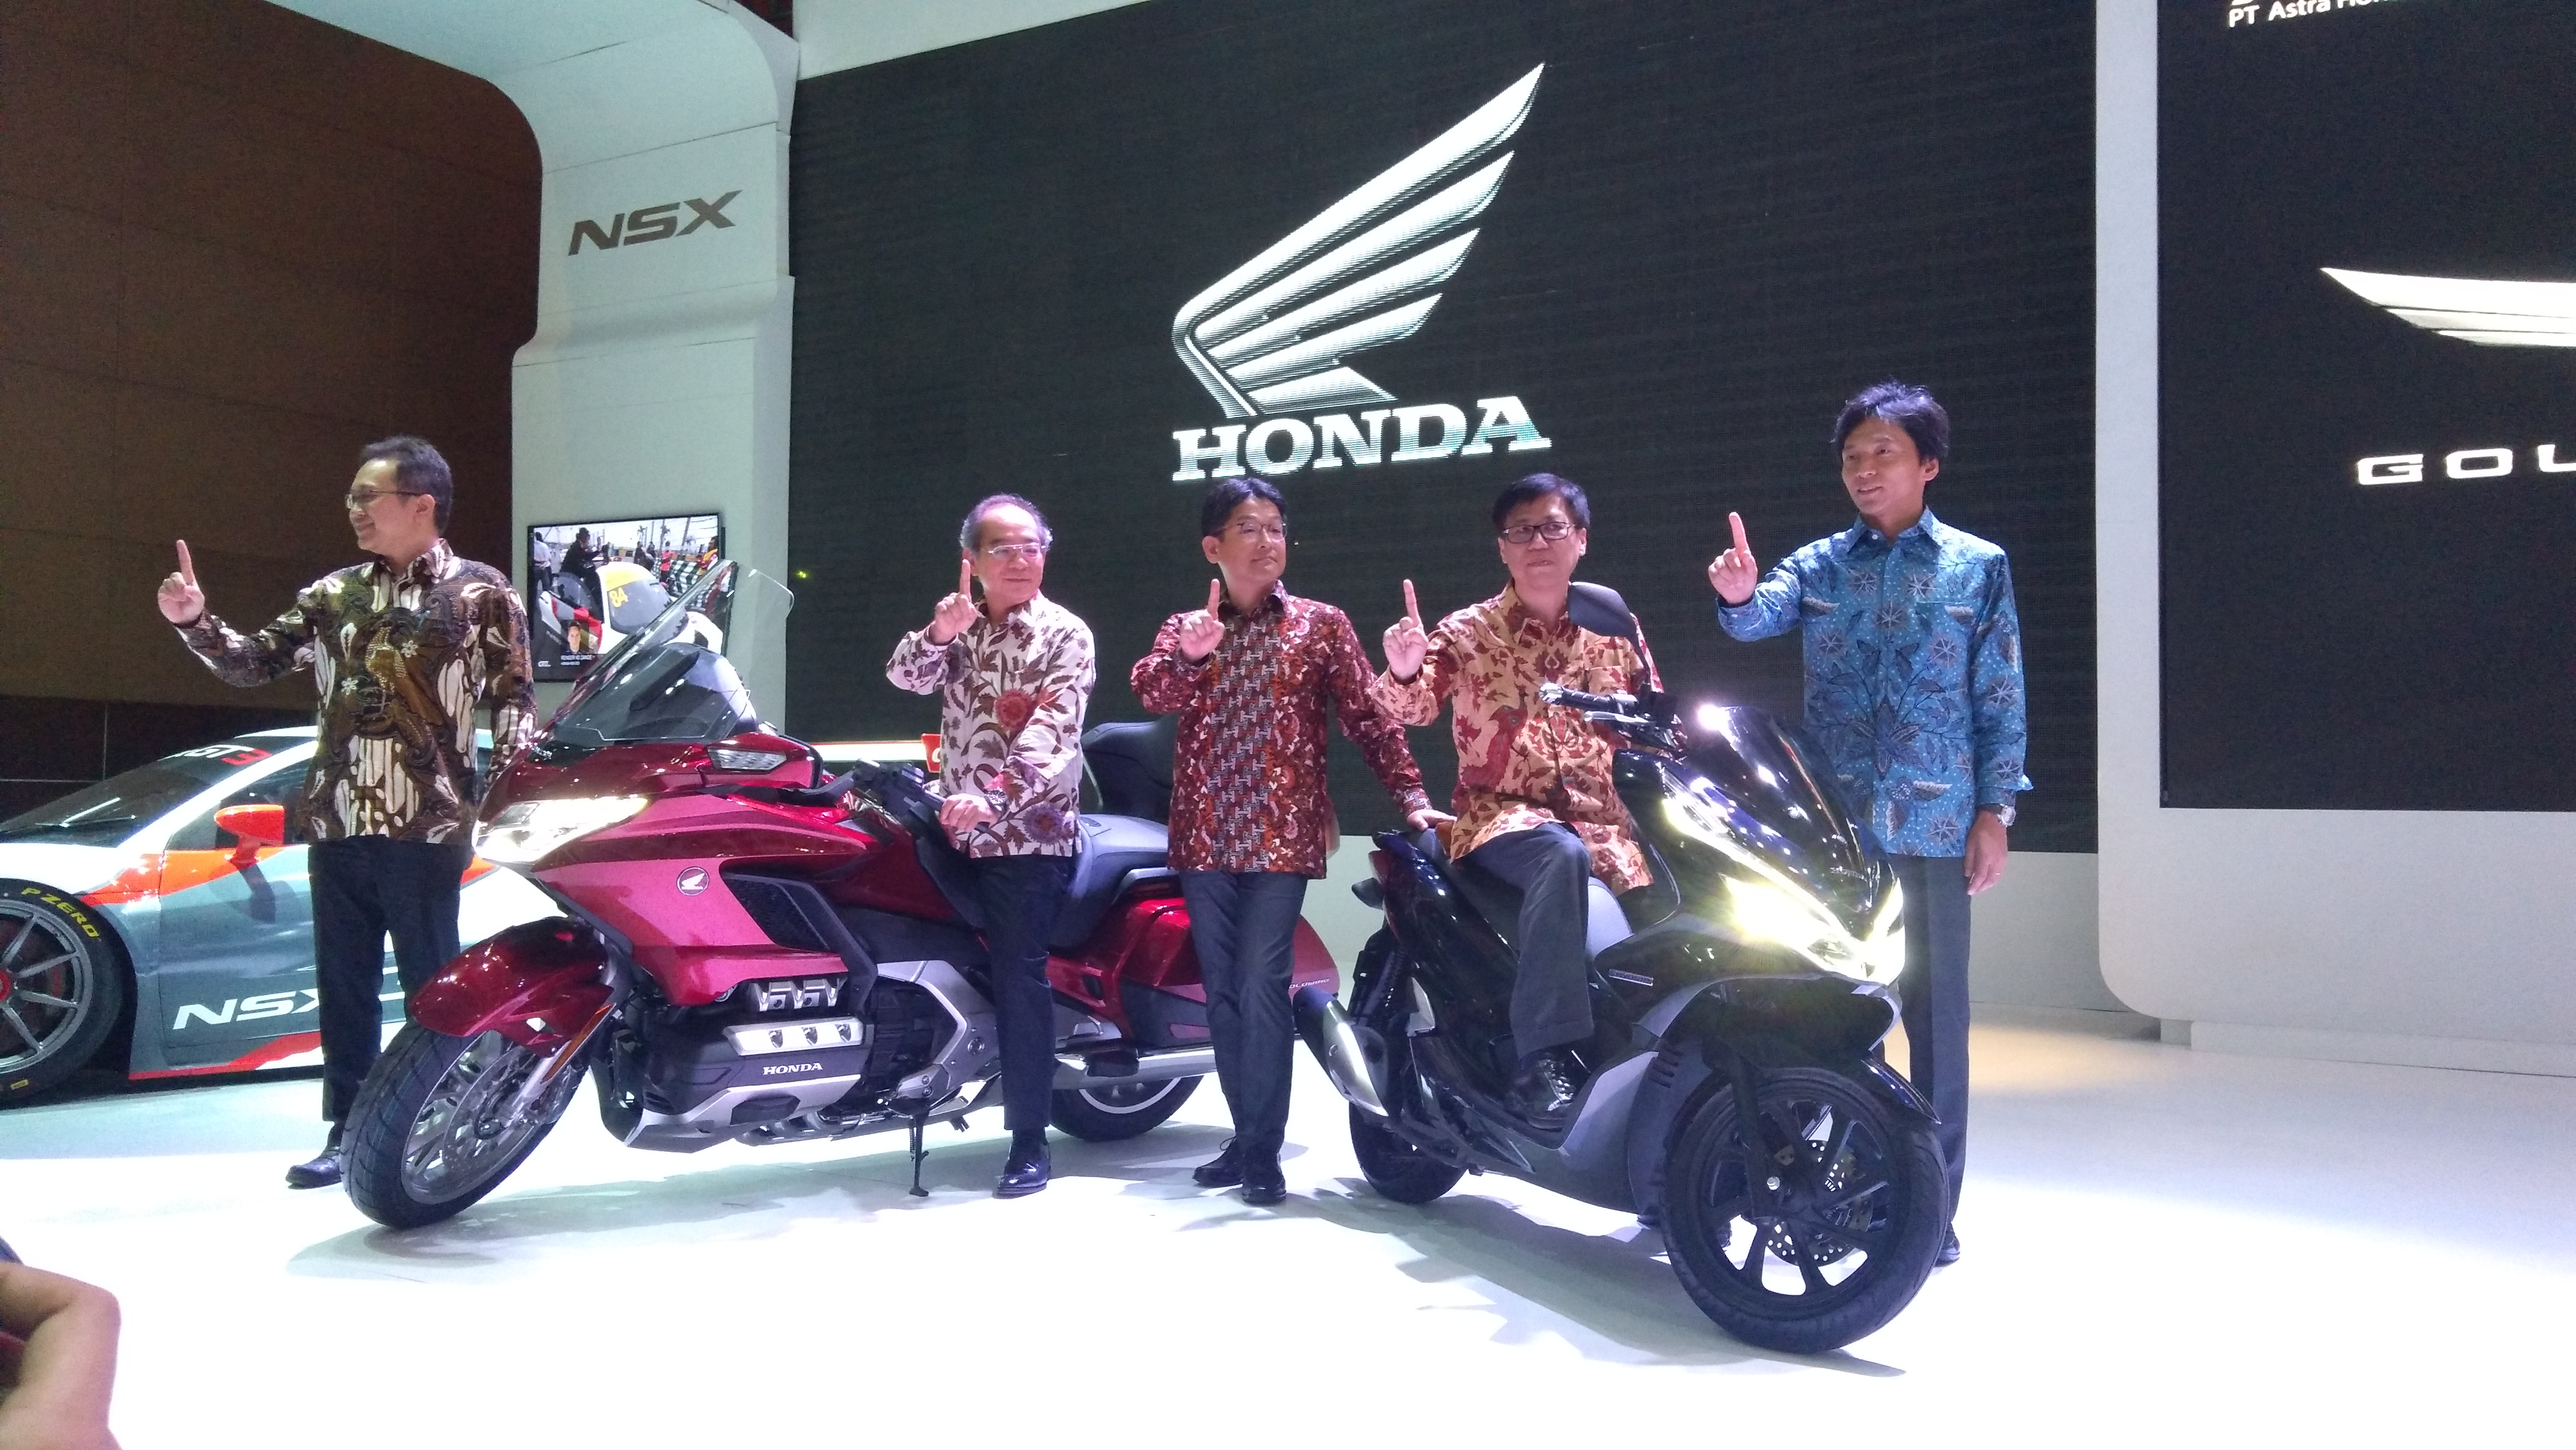 Motor Honda Bagi Bagi Diskon Besar Selama IIMS 2018